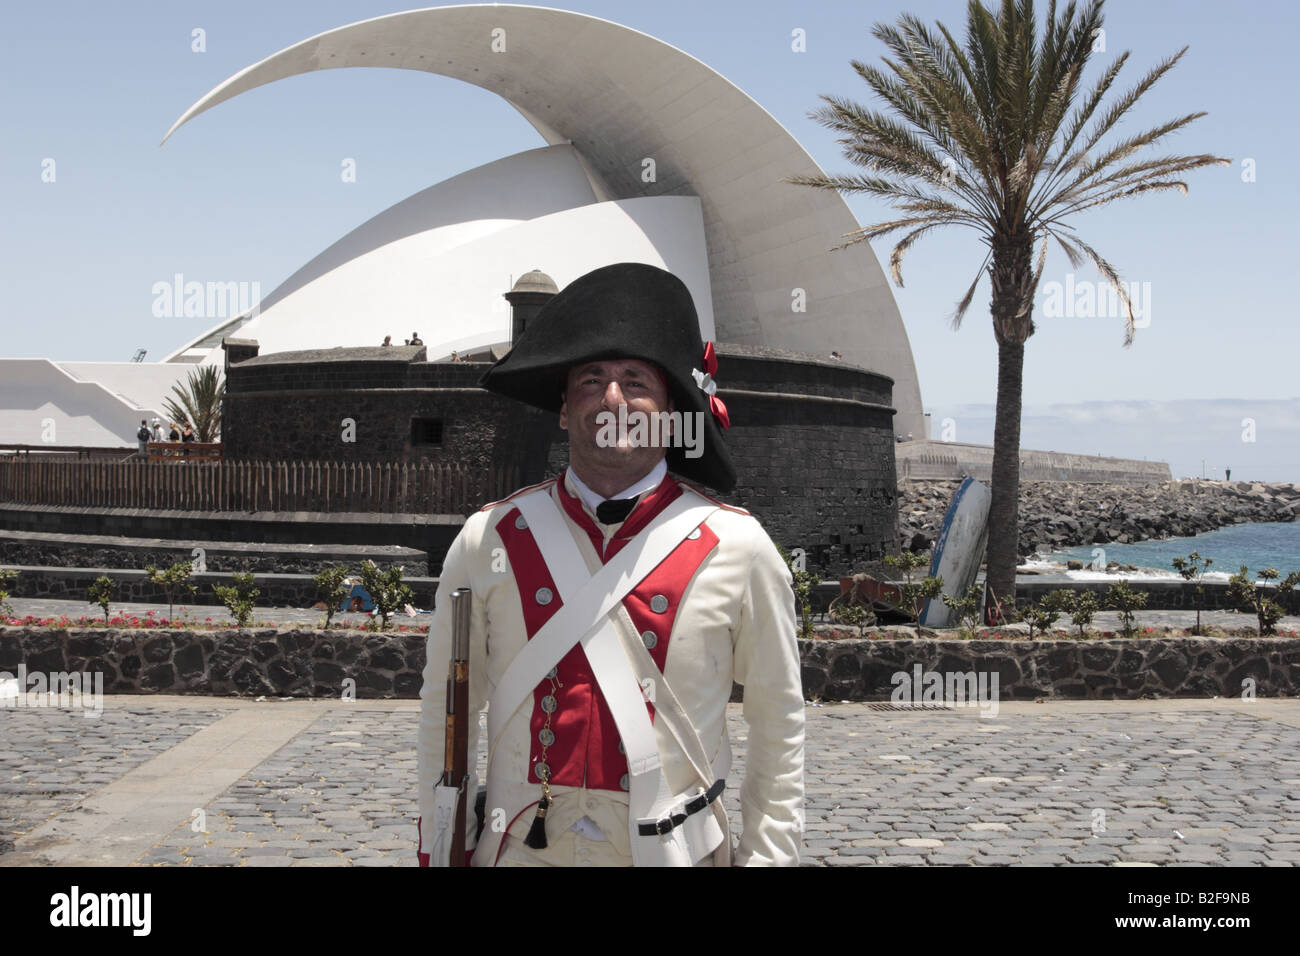 A member of the Spanish forces played by Miguel Diaz Llanos Fernandez de la Puente after a reenactment of the 1797 battle of Santa Cruz, Tenerife Stock Photo